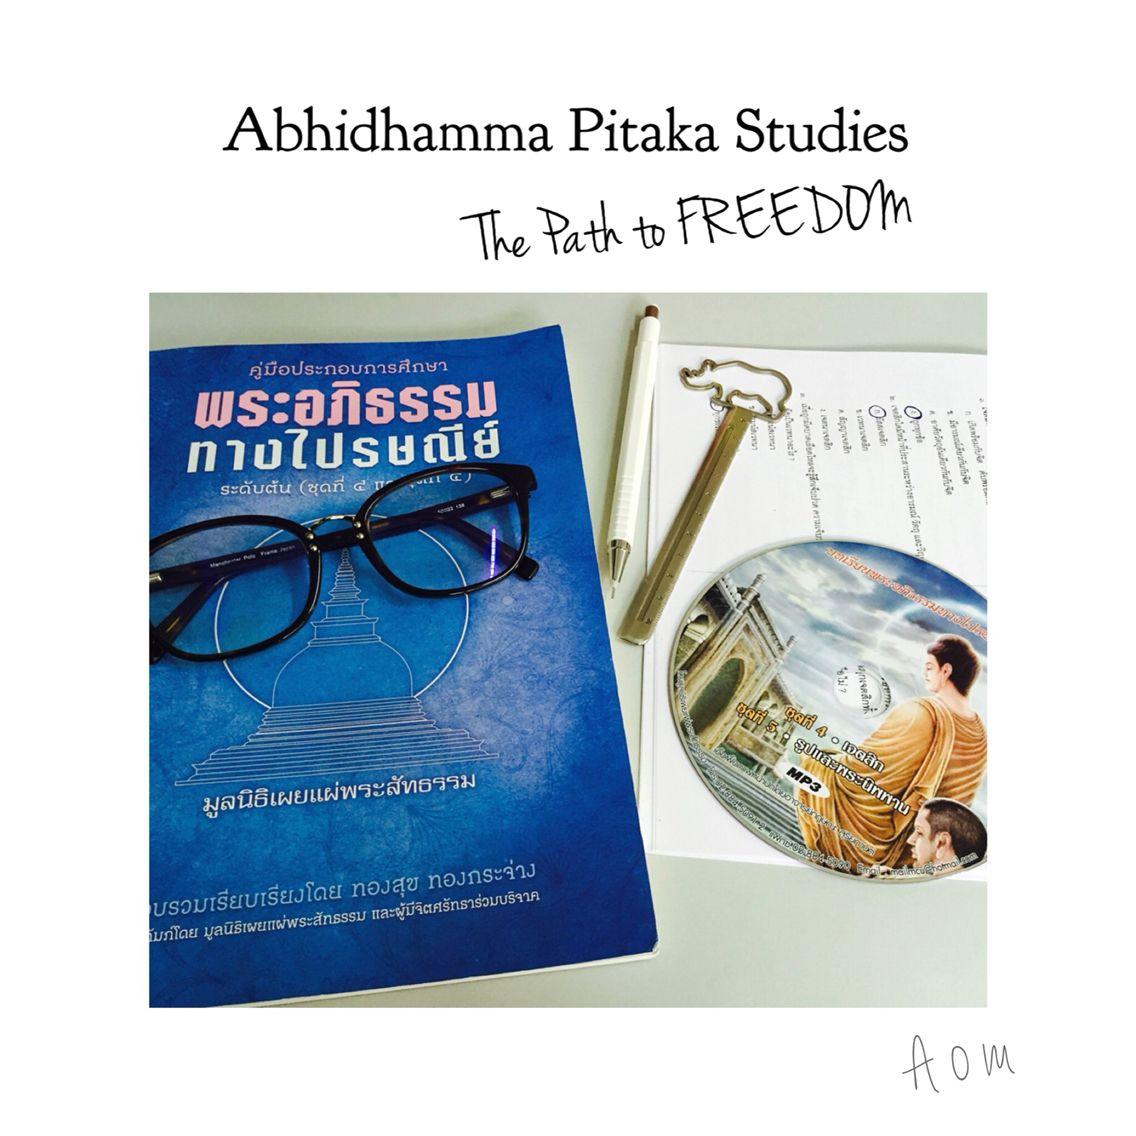 Abhidhamma Pitaka Studies. Mission to accomplish ... | My 365 ...